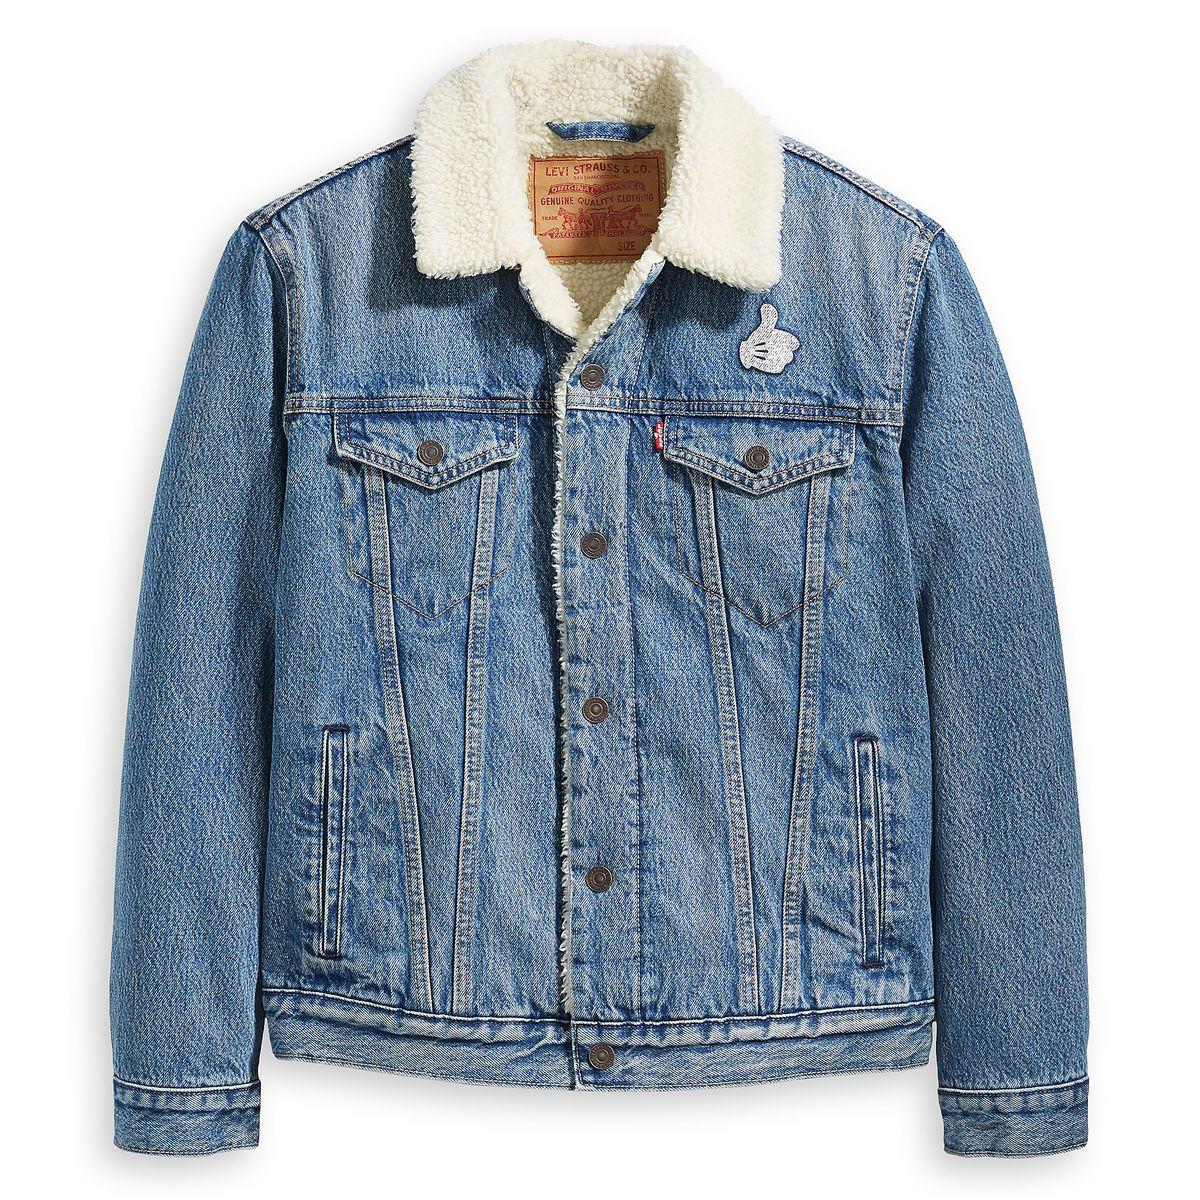 Mickey Mouse Faux Fur Denim Jacket For Men By Levi S Denim Jacket With Fur Fur Lined Denim Jacket Fur Jacket Mens [ 1200 x 1200 Pixel ]